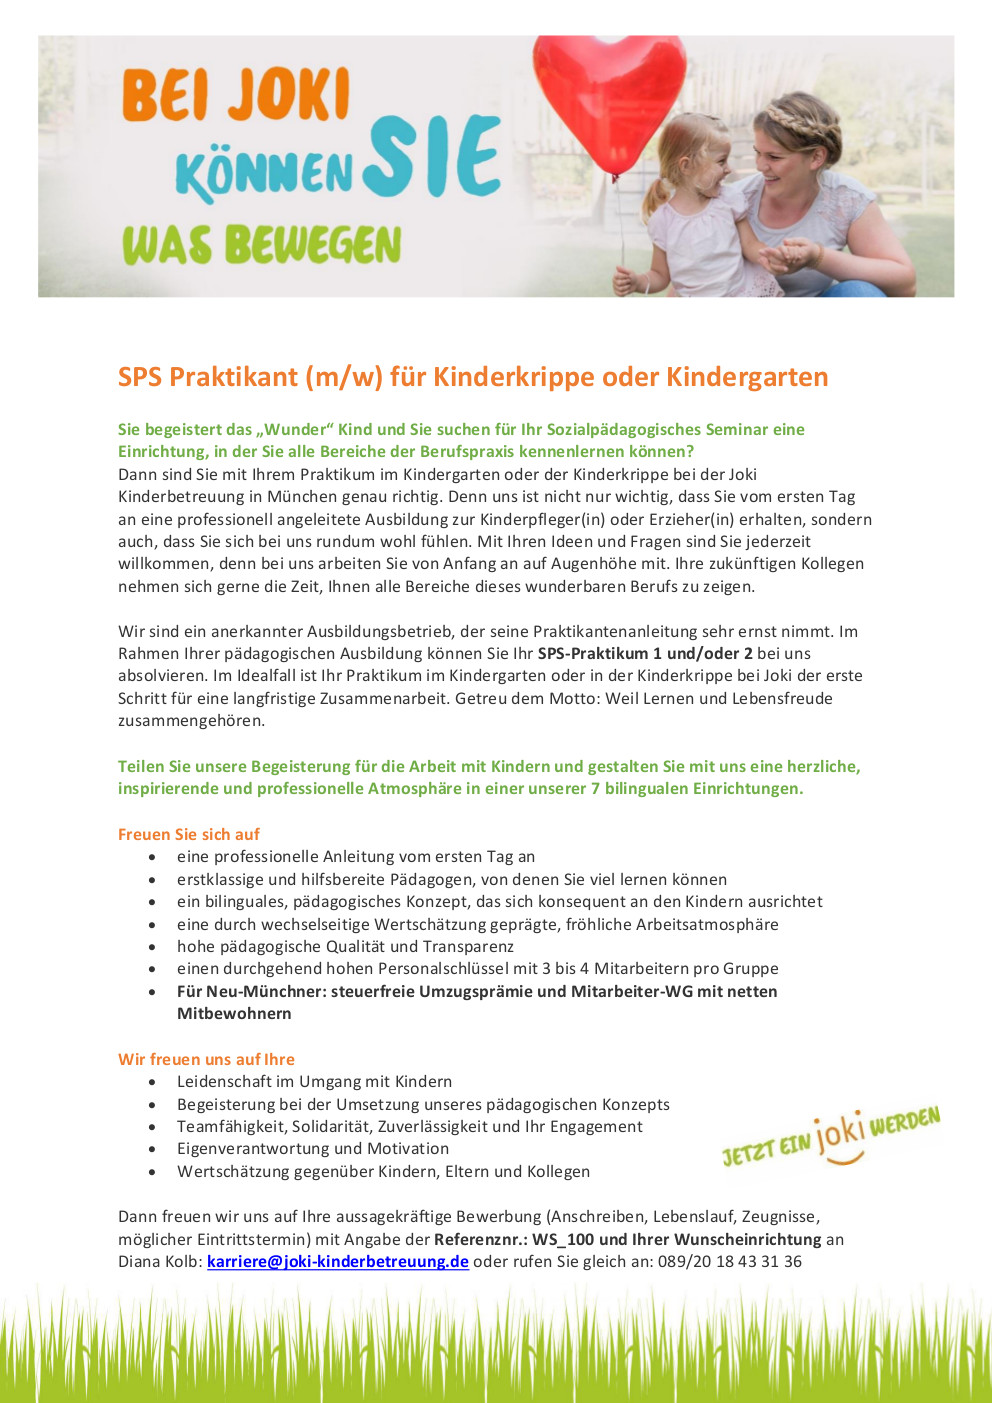 sps-praktikant-joki-kinderbetreuung-161013